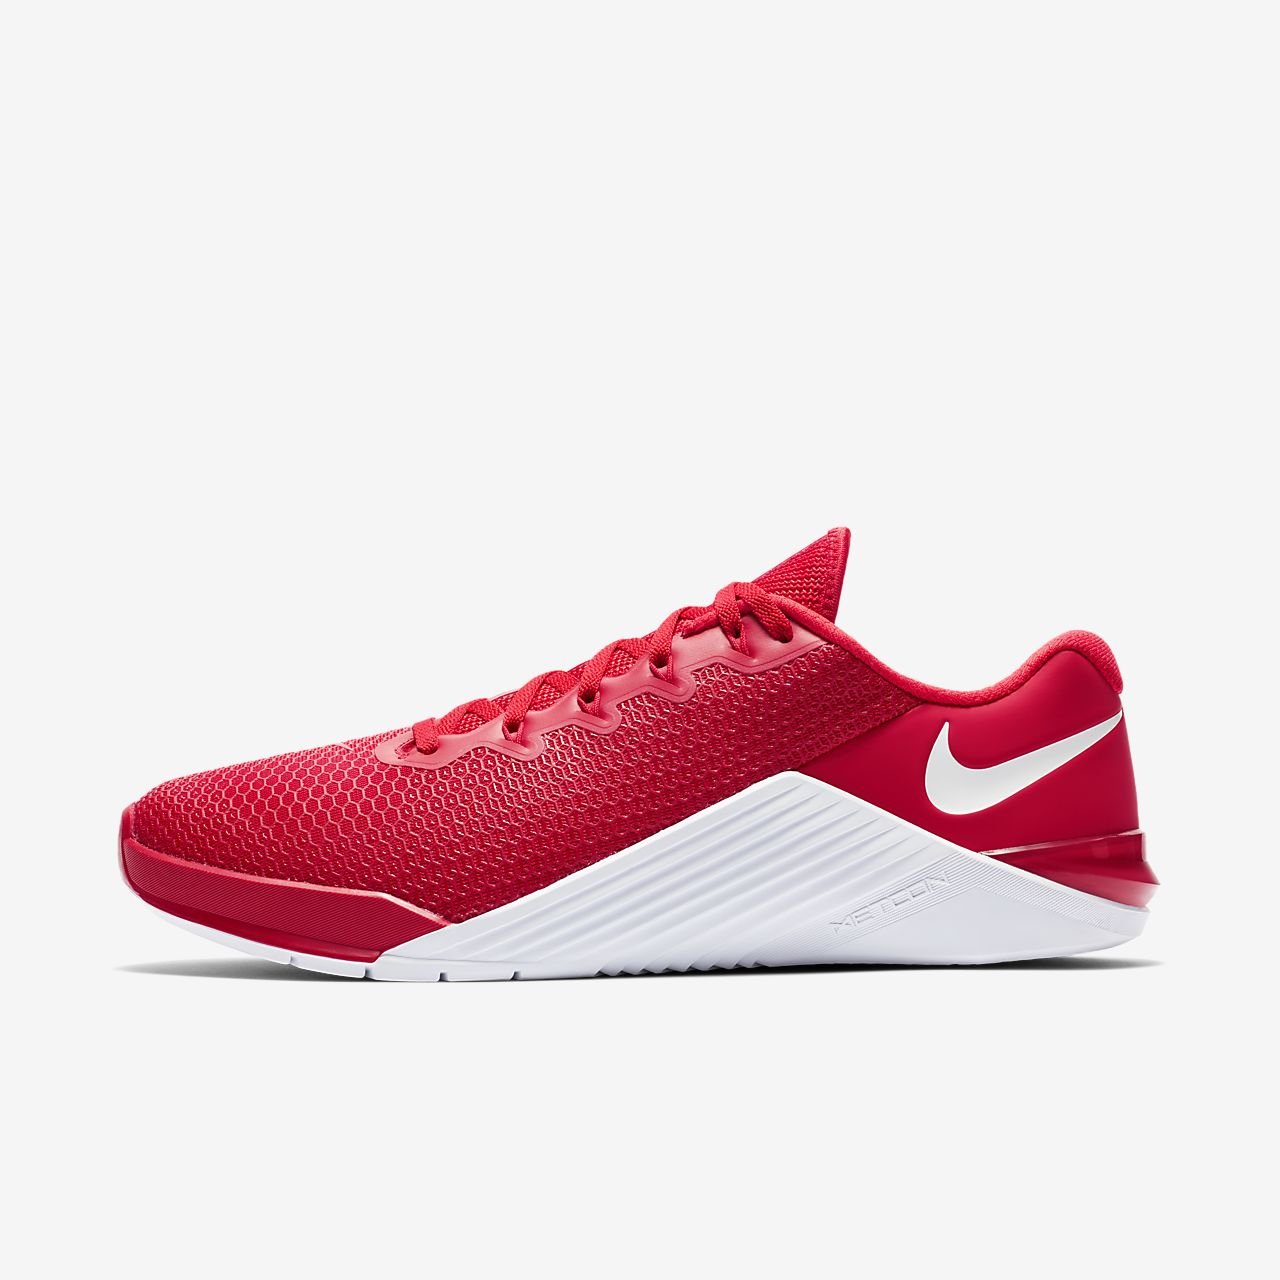 innovatief ontwerp betrouwbare kwaliteit bespaar Nike Metcon 5 Trainingsschoen